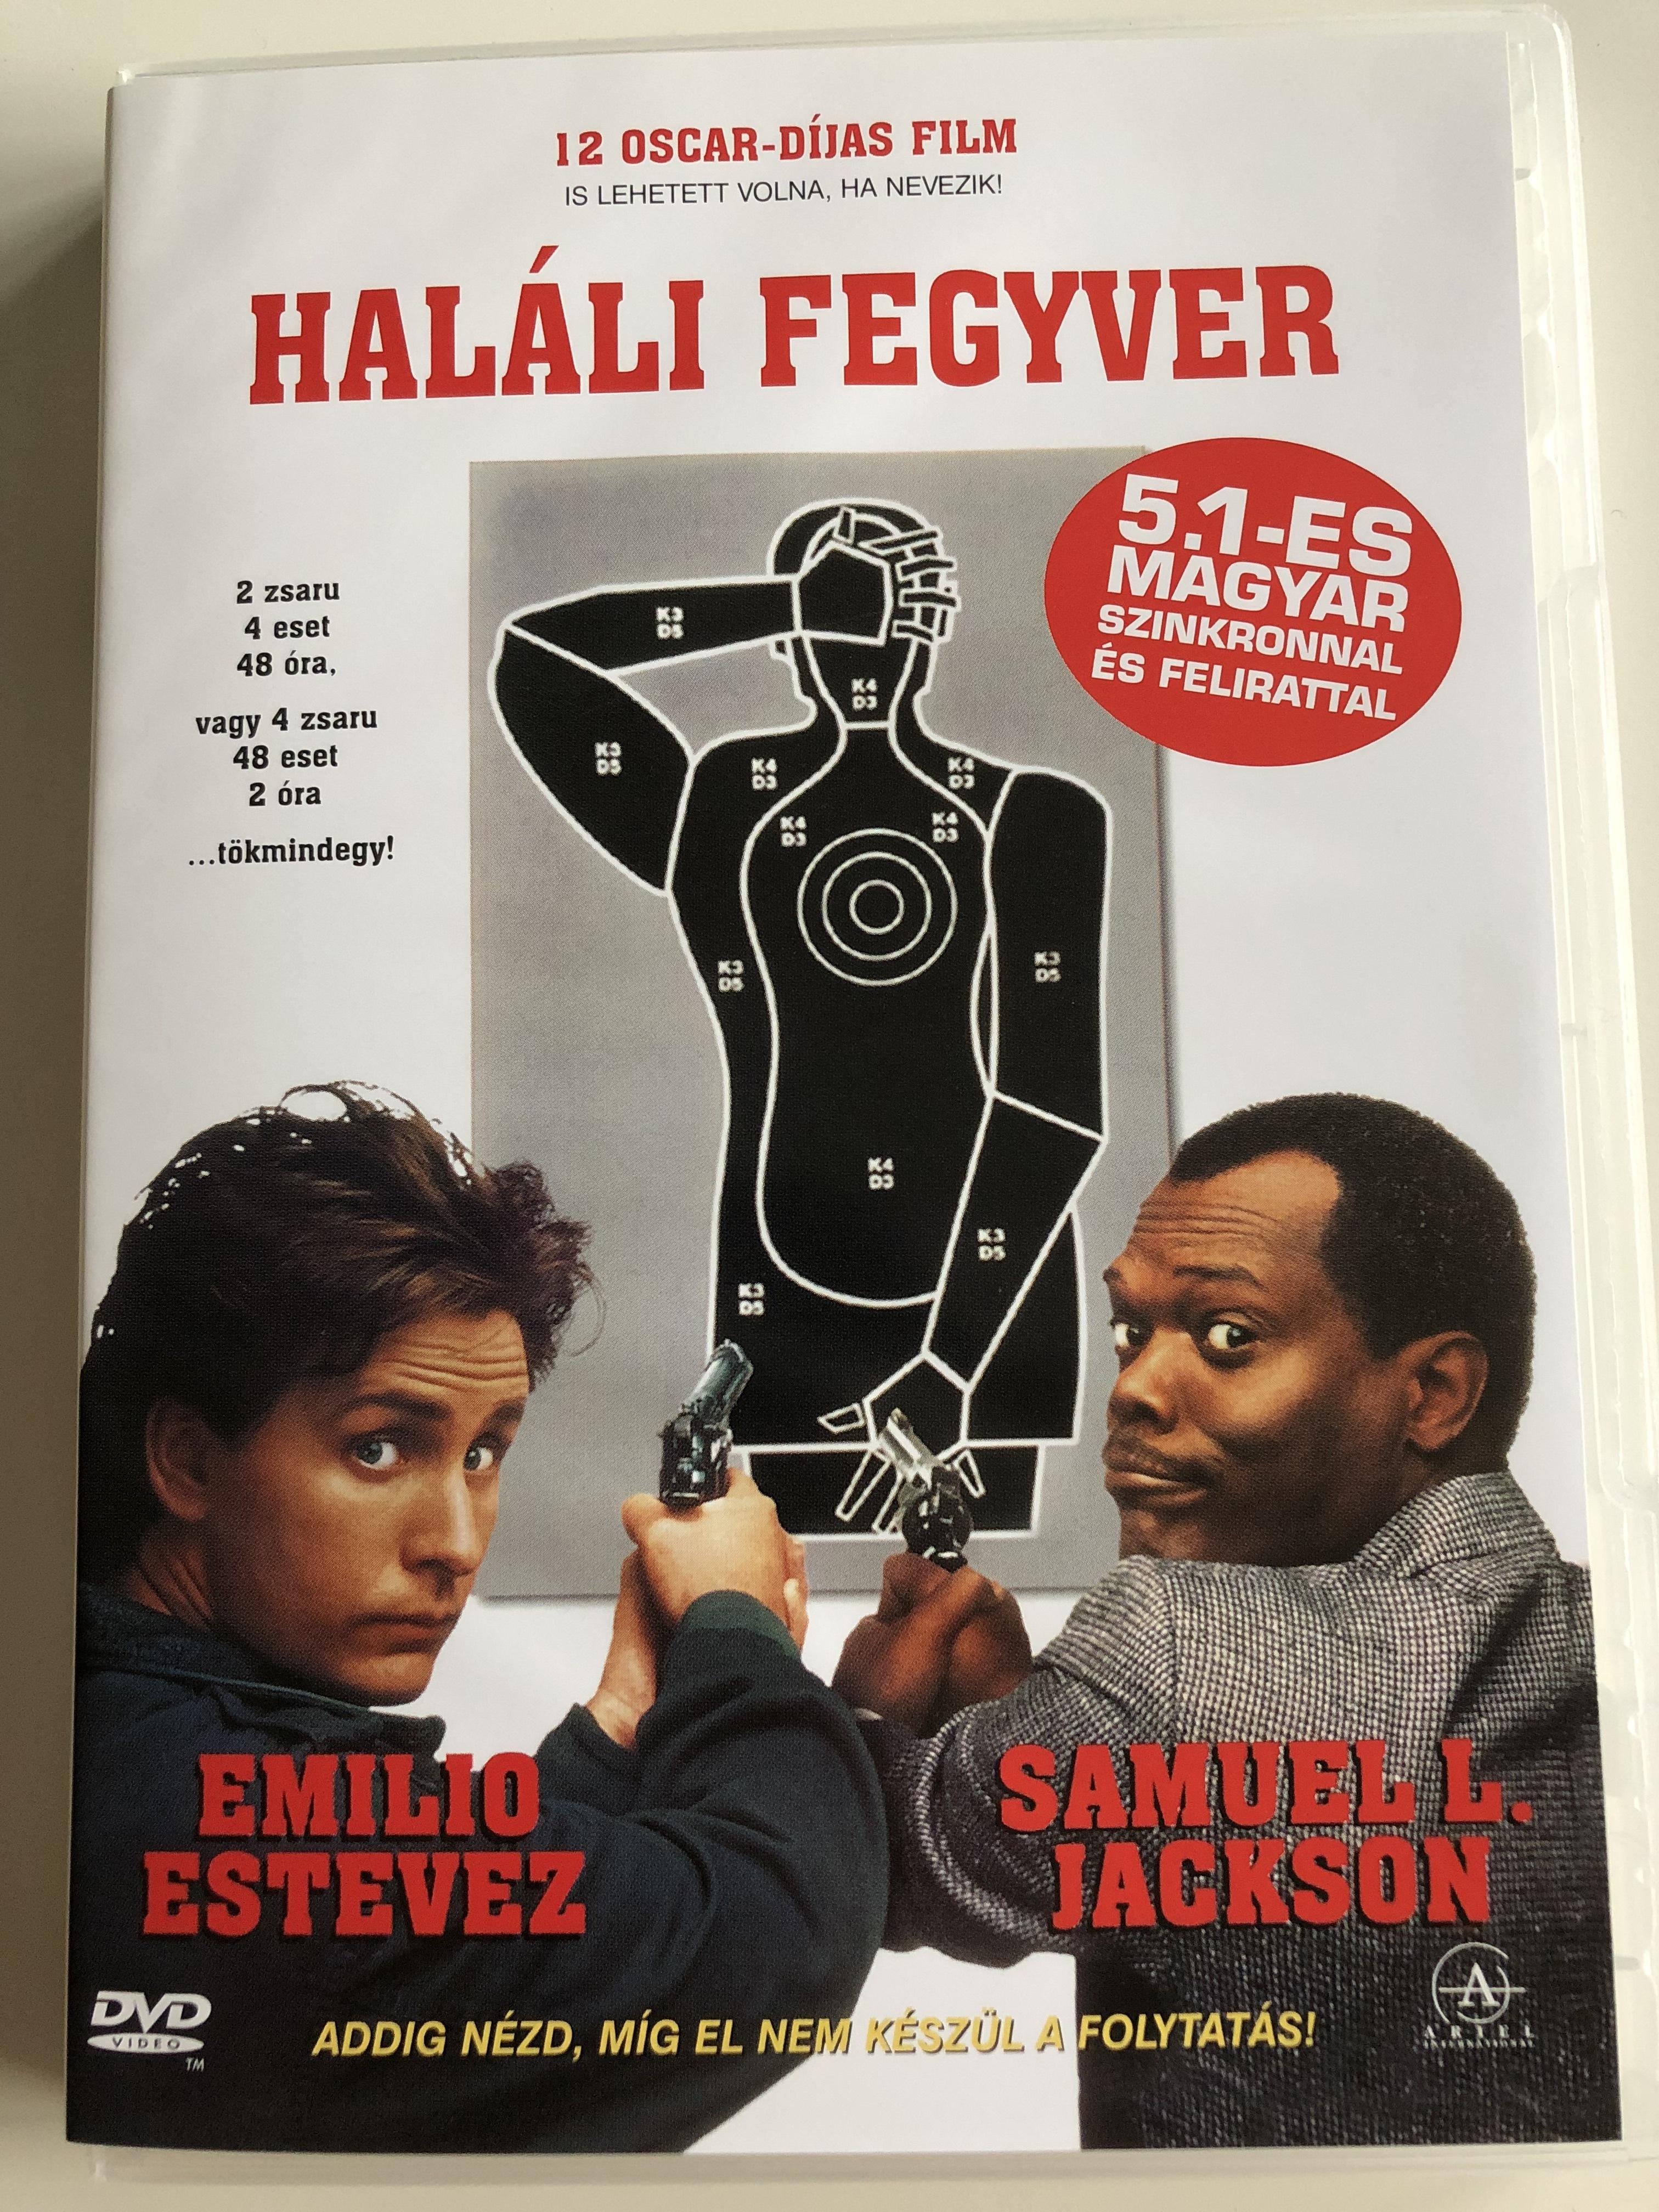 national-lampoon-s-loaded-weapon-dvd-1993-hal-li-fegyver-directed-by-gene-quintano-starring-emilio-estevez-samuel-l.-jackson-jon-lovitz-kathy-ireland-william-shatner-whoopi-goldberg-1-.jpg